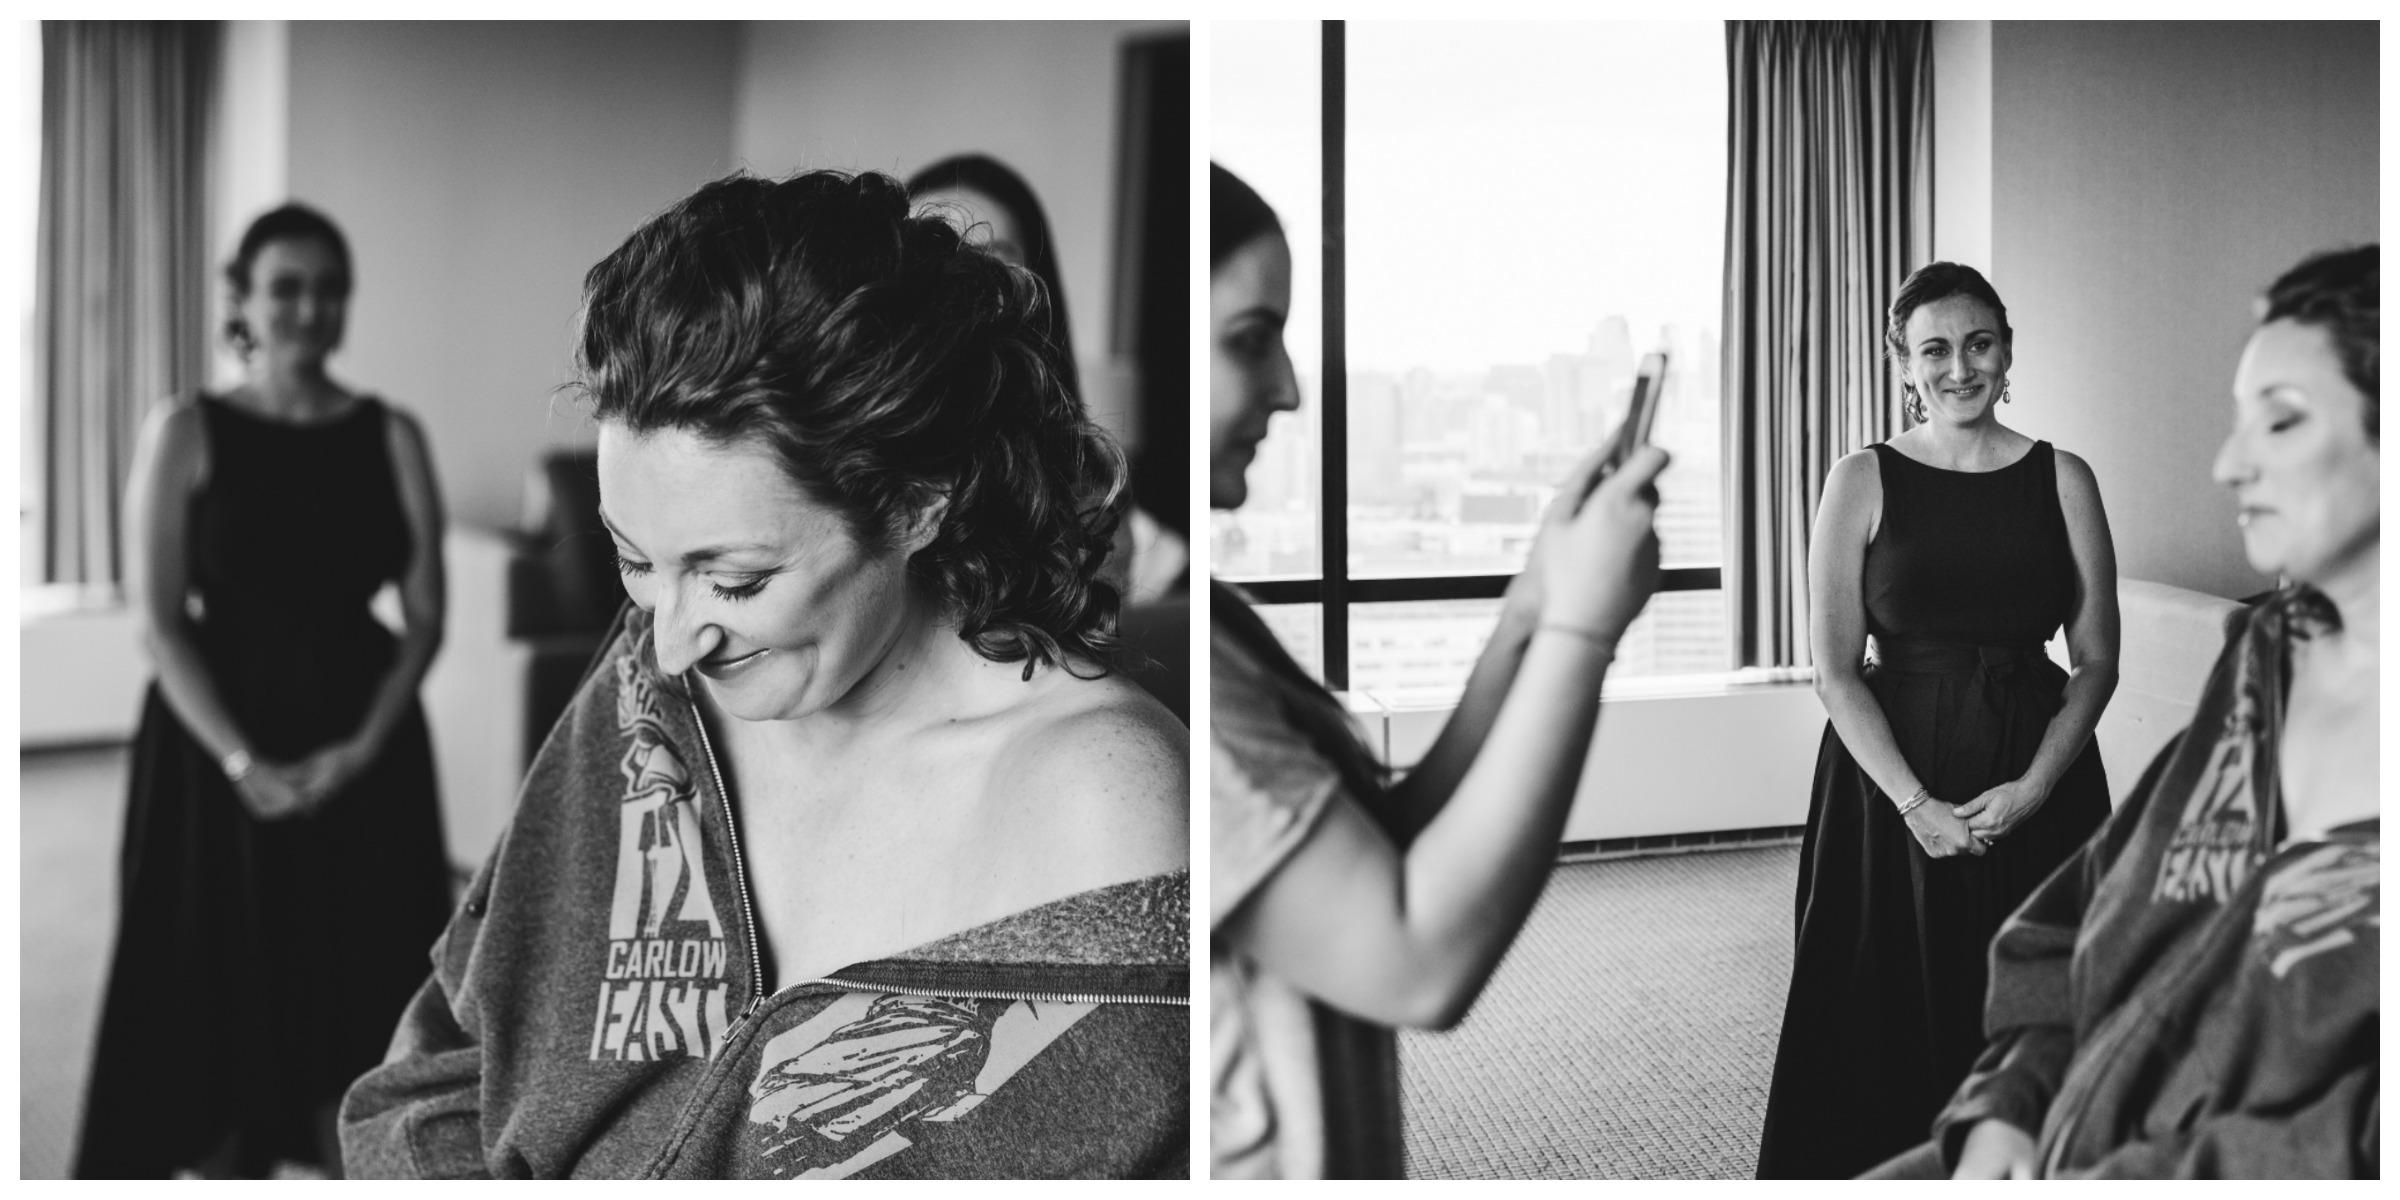 BATTERY PARK GARDENS WEDDING - NYC INTIMATE WEDDING PHOTOGRAPHER - CHI-CHI ARI 2.jpg